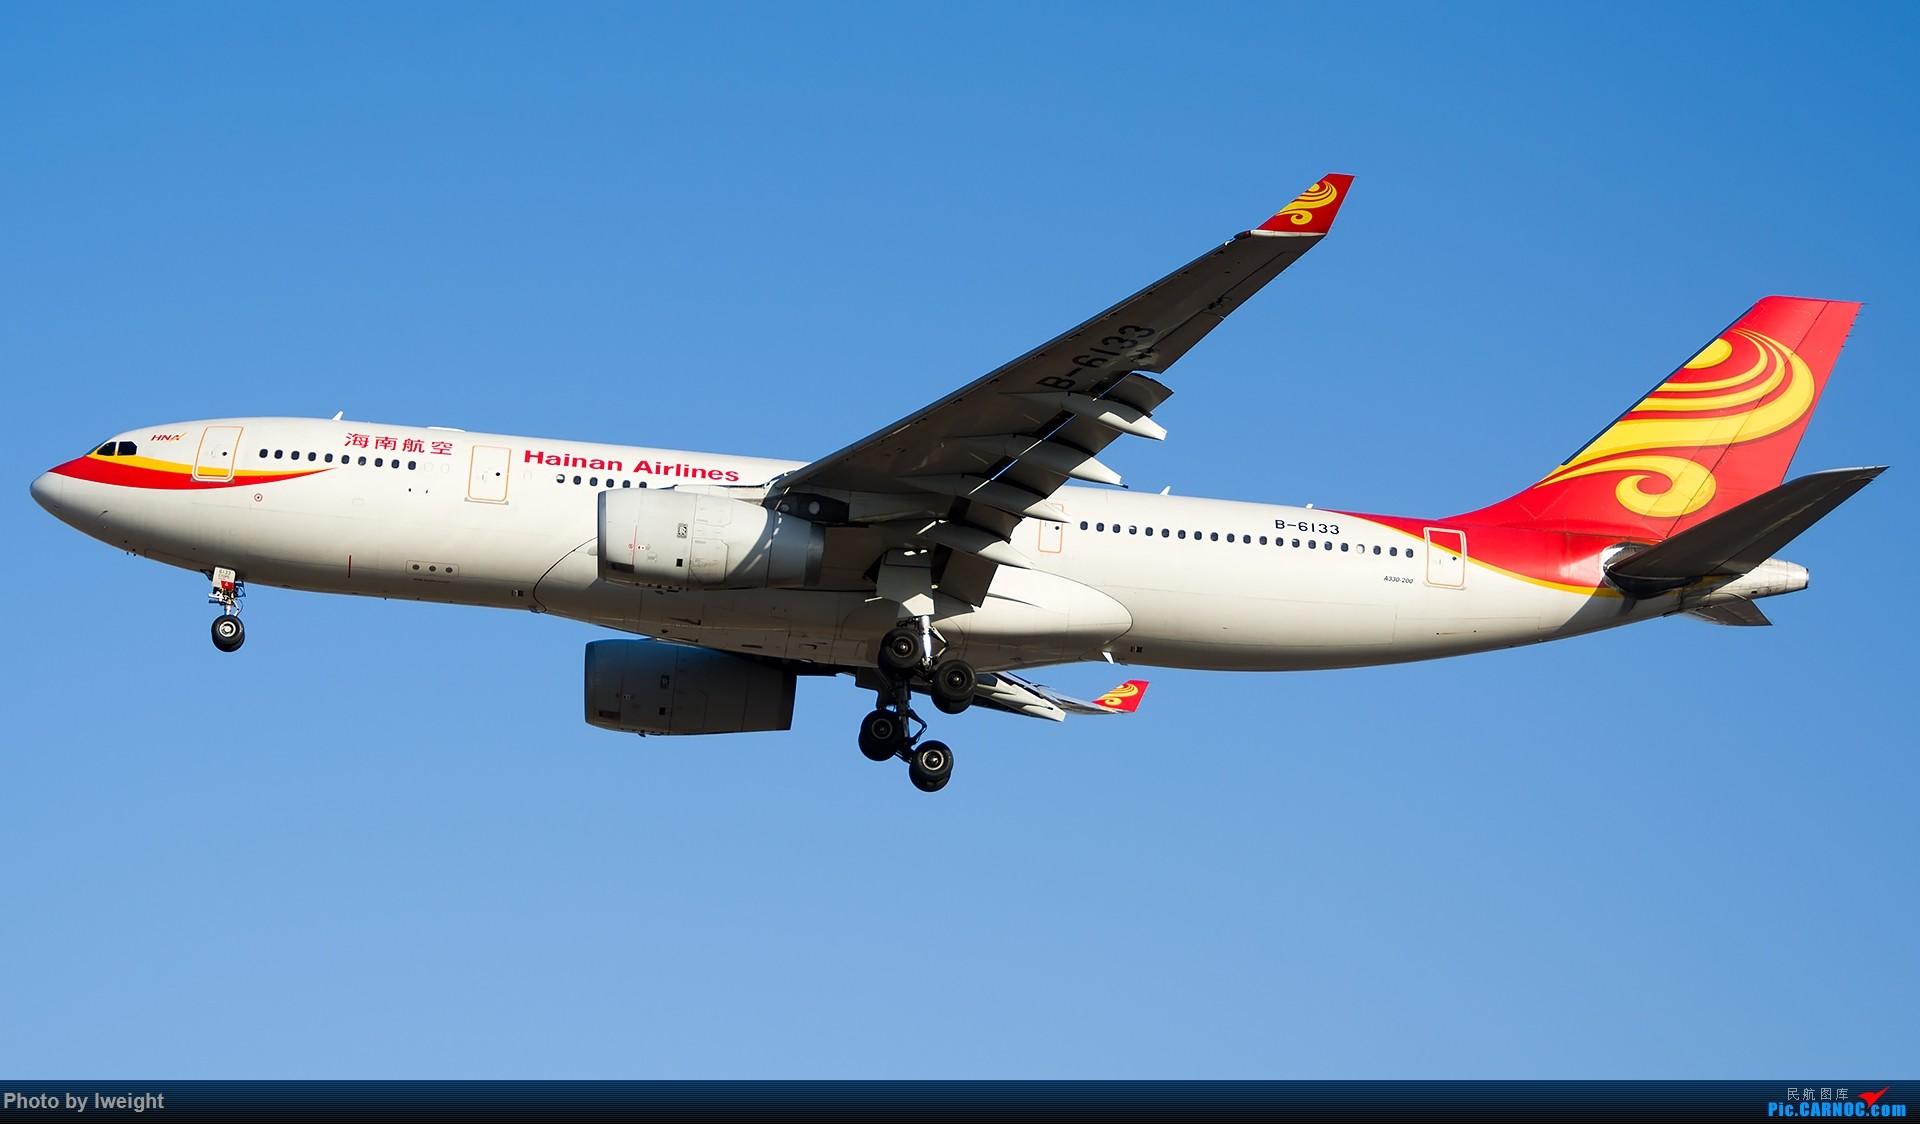 Re:[原创]北京难得的好天气,随手拍了一些渣图【2015-01-27】 AIRBUS A330-200 B-6133 中国北京首都国际机场